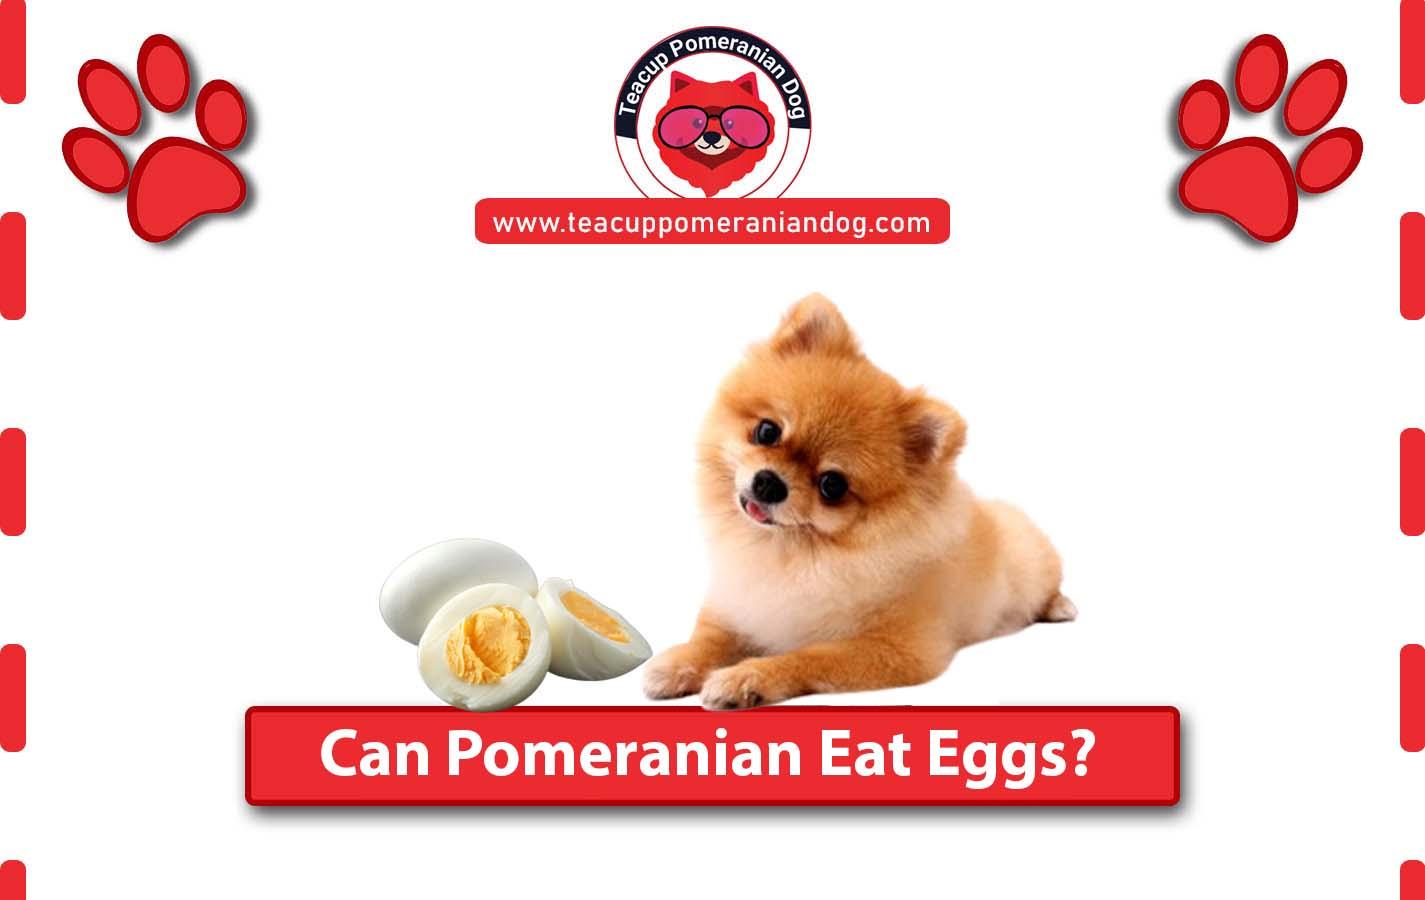 Can Pomeranian Eat eggs